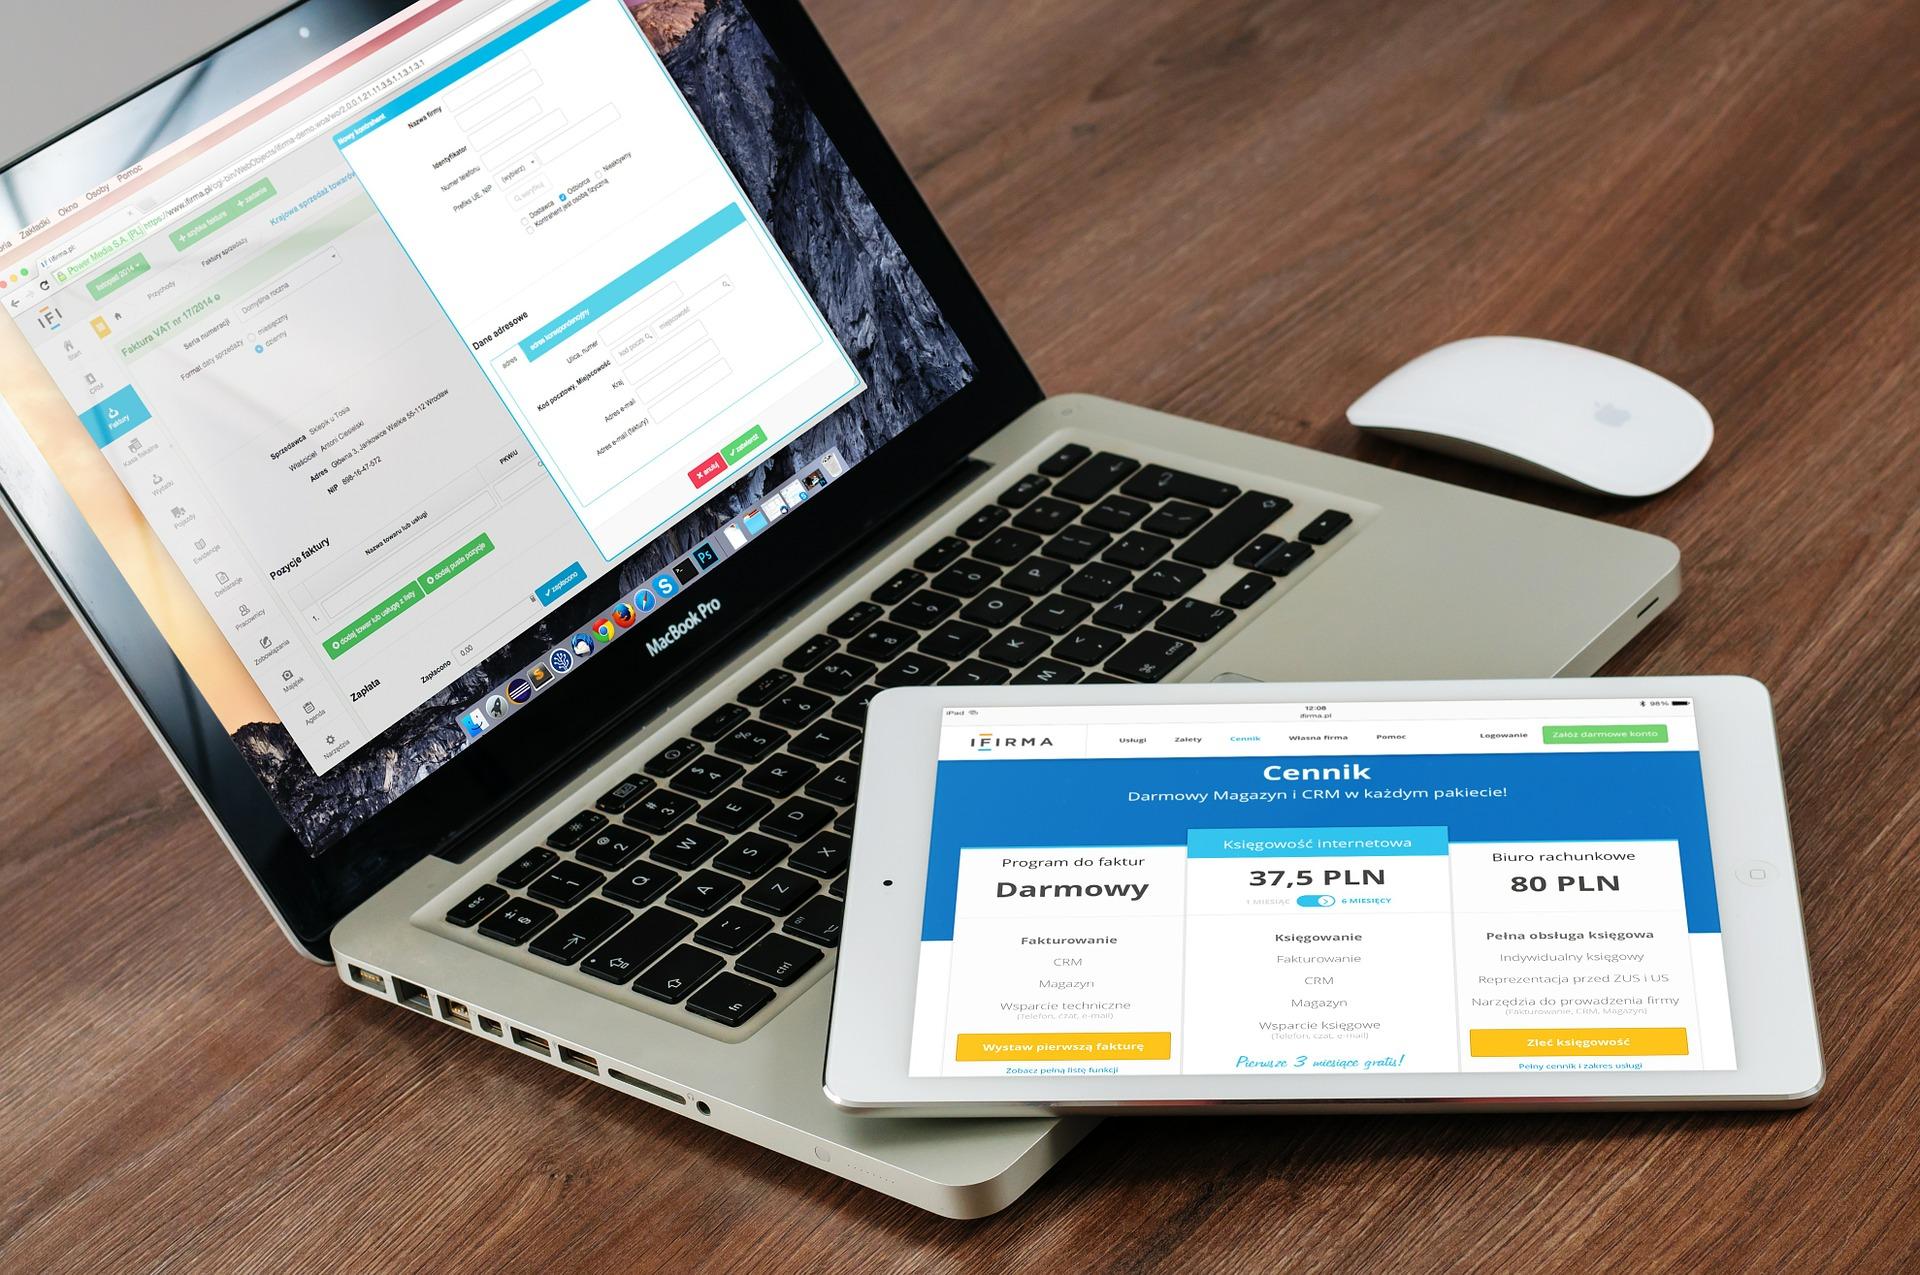 Consumerization of Enterprize Software